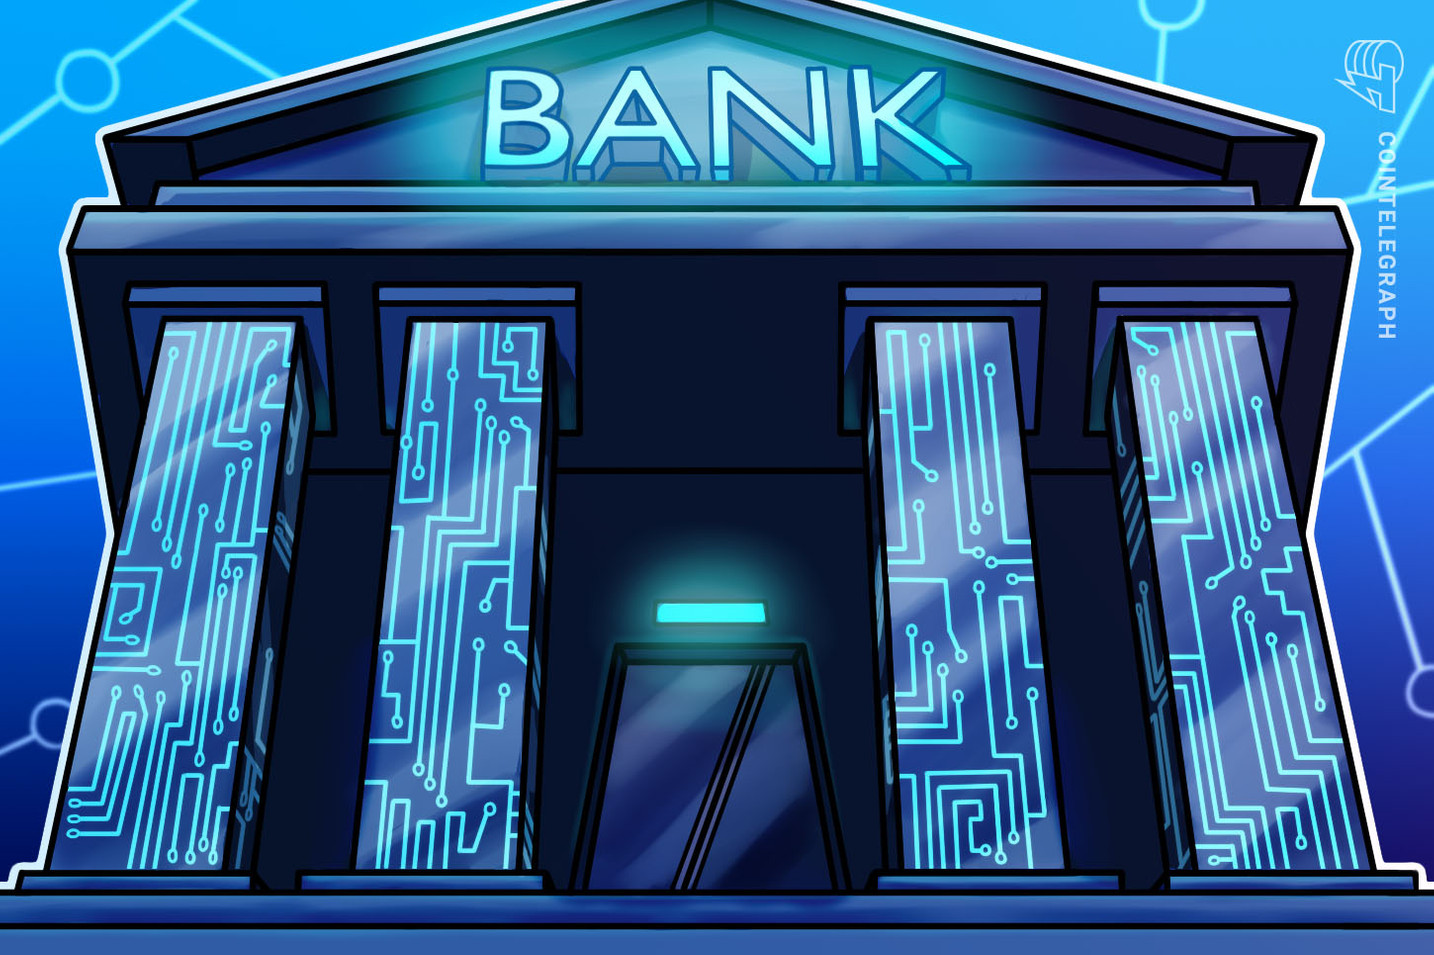 Barclays e RBS se unem ao teste de blockchain para imóveis 40-Strong da R3